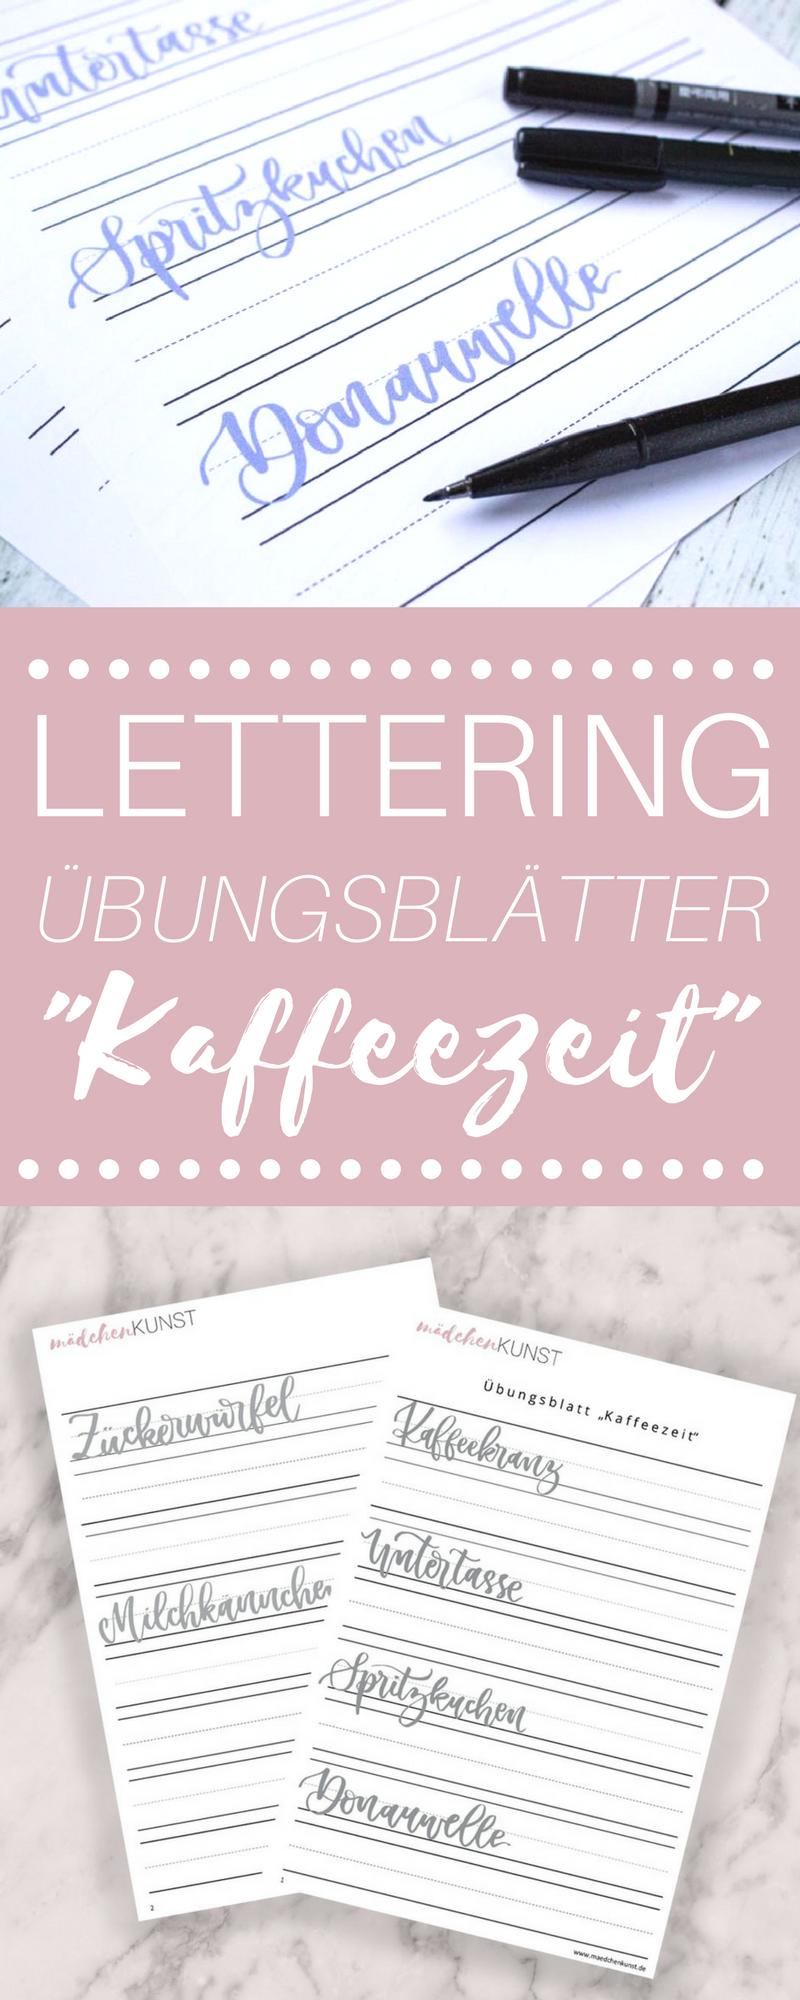 Lettering übungsblatt Kaffeezeit Bullet Journal Pinterest